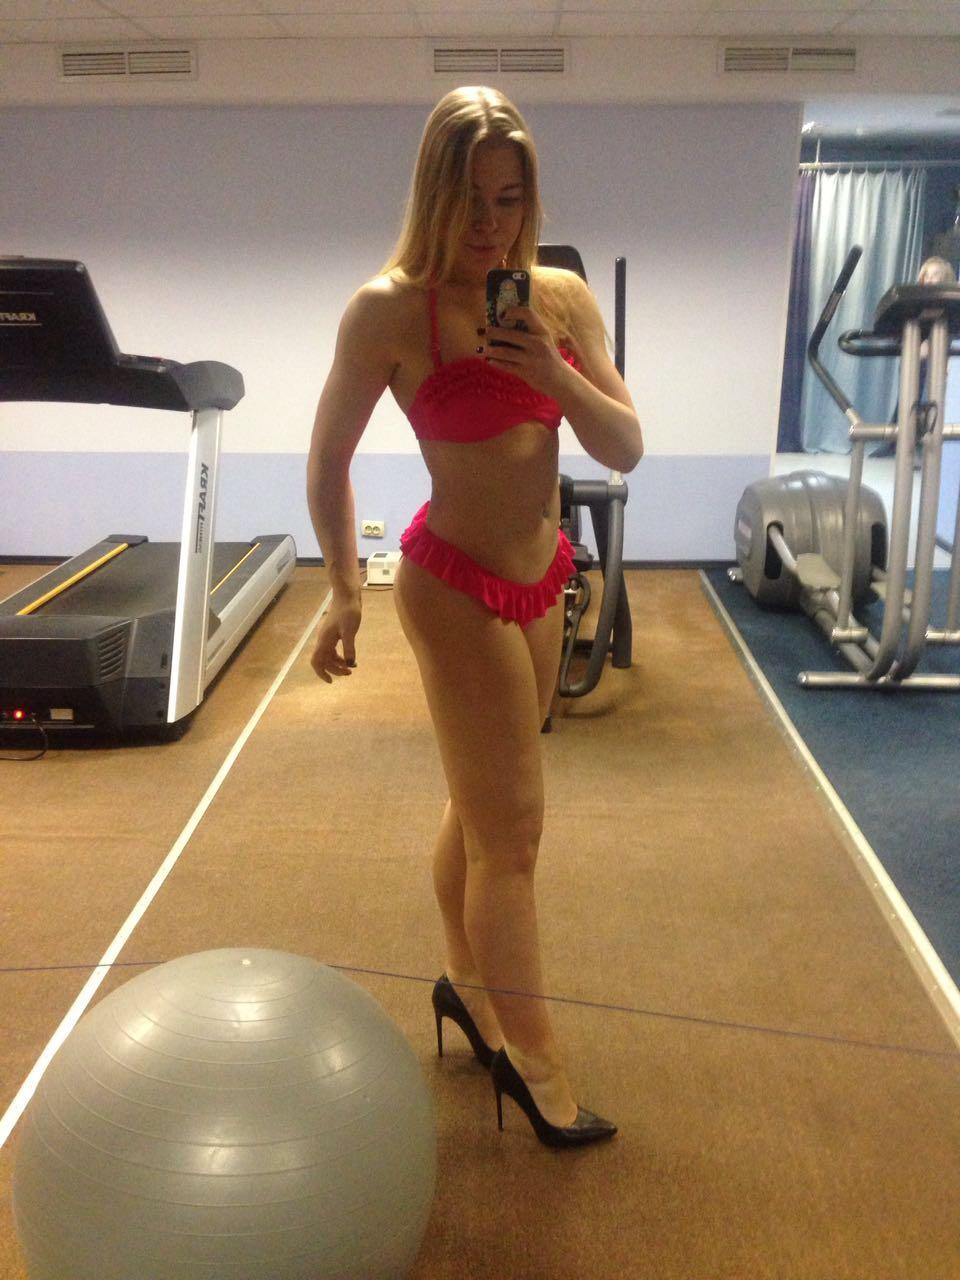 Нужна работа над пропорциями и качеством мышц